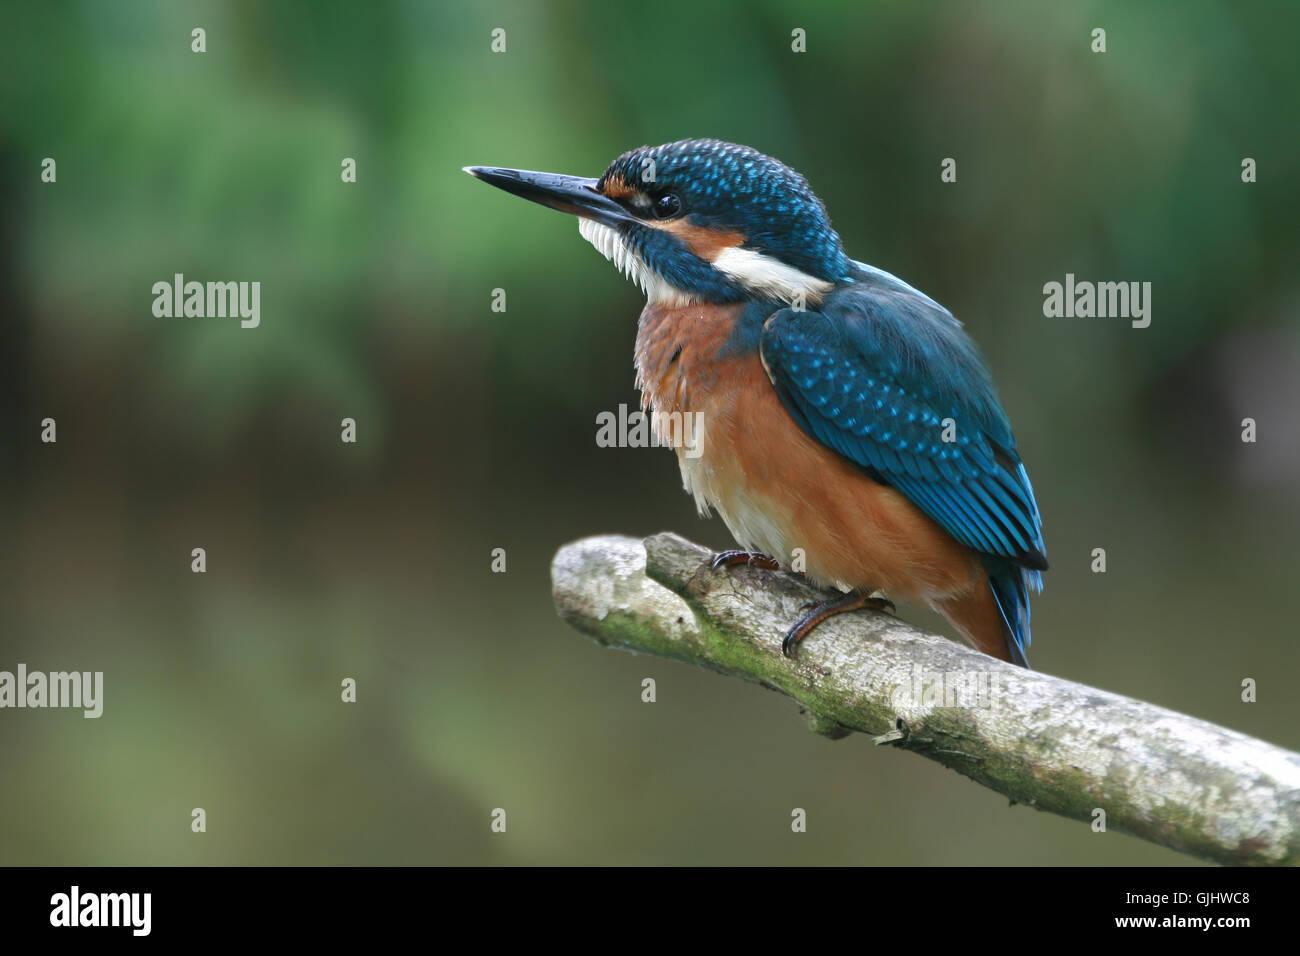 bird birds kingfisher - Stock Image